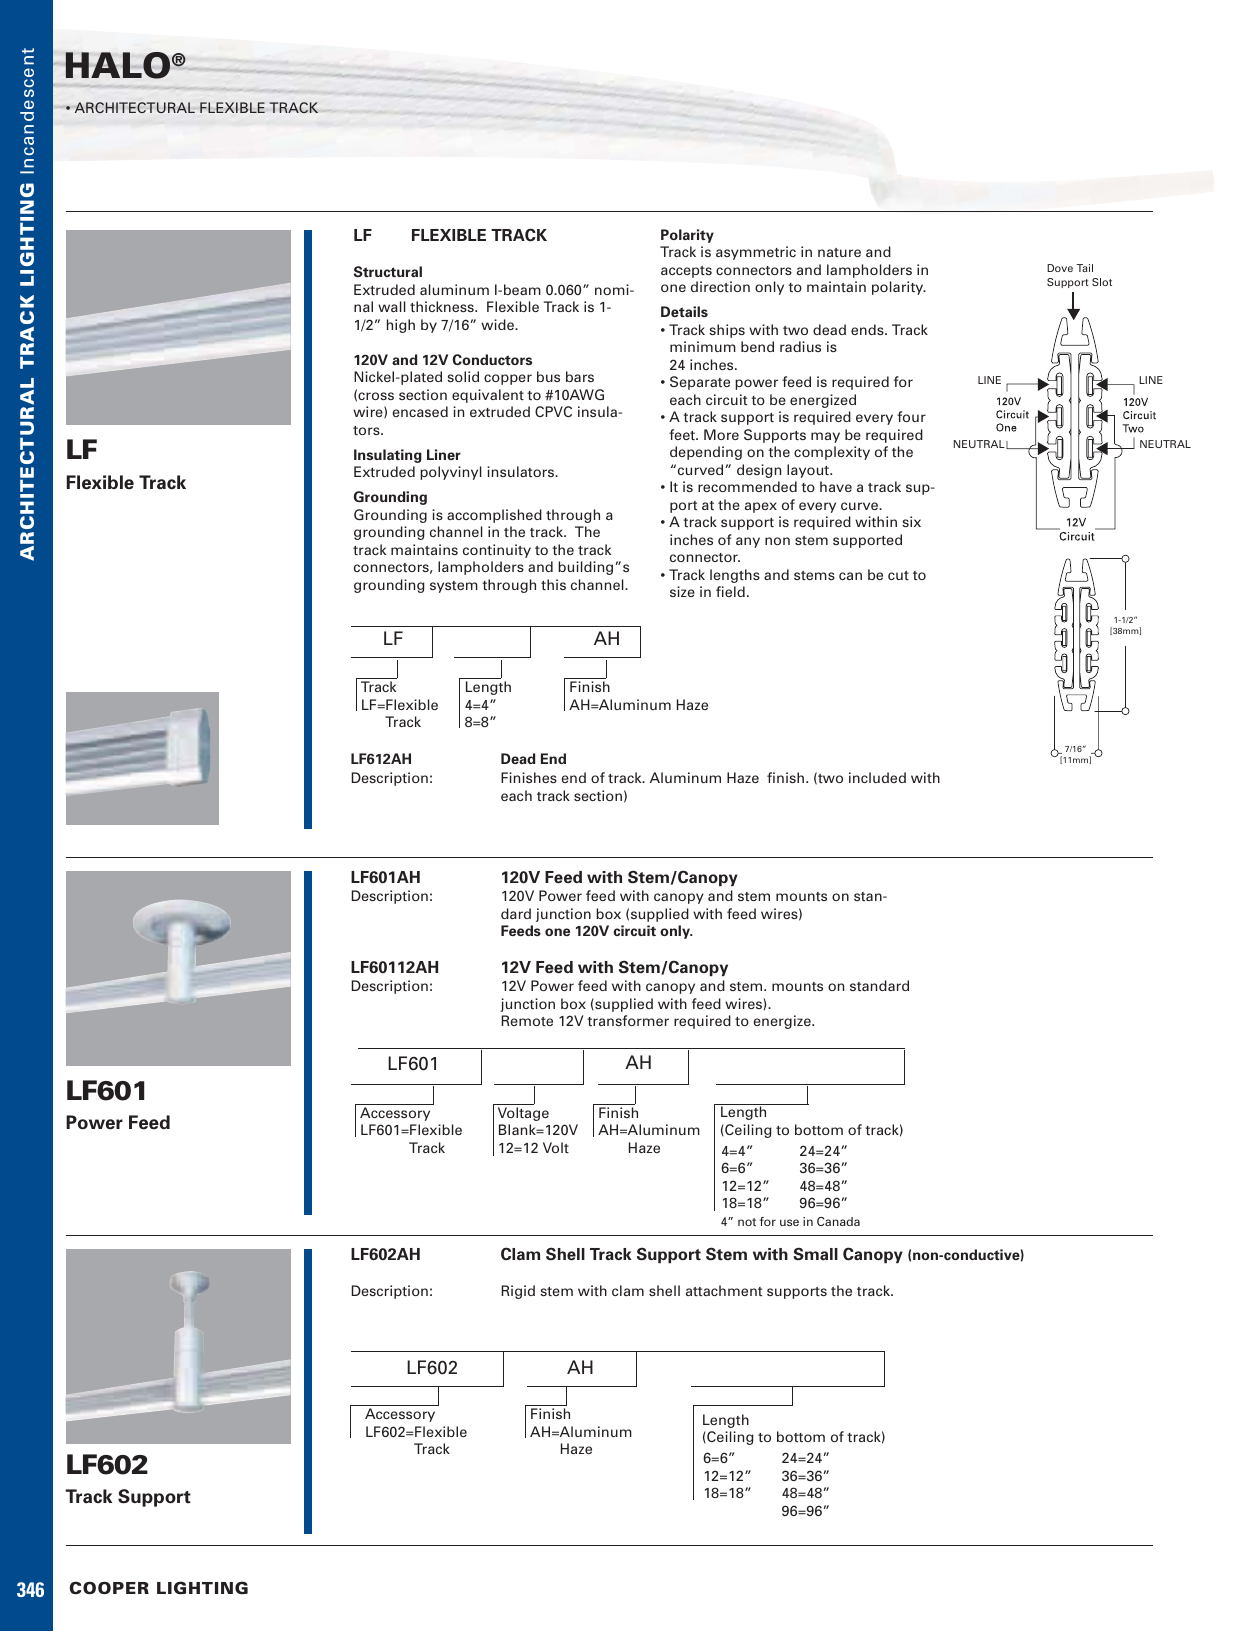 Cooper Lighting Lf601 Users Manual Wiring Neutral Bus Bar